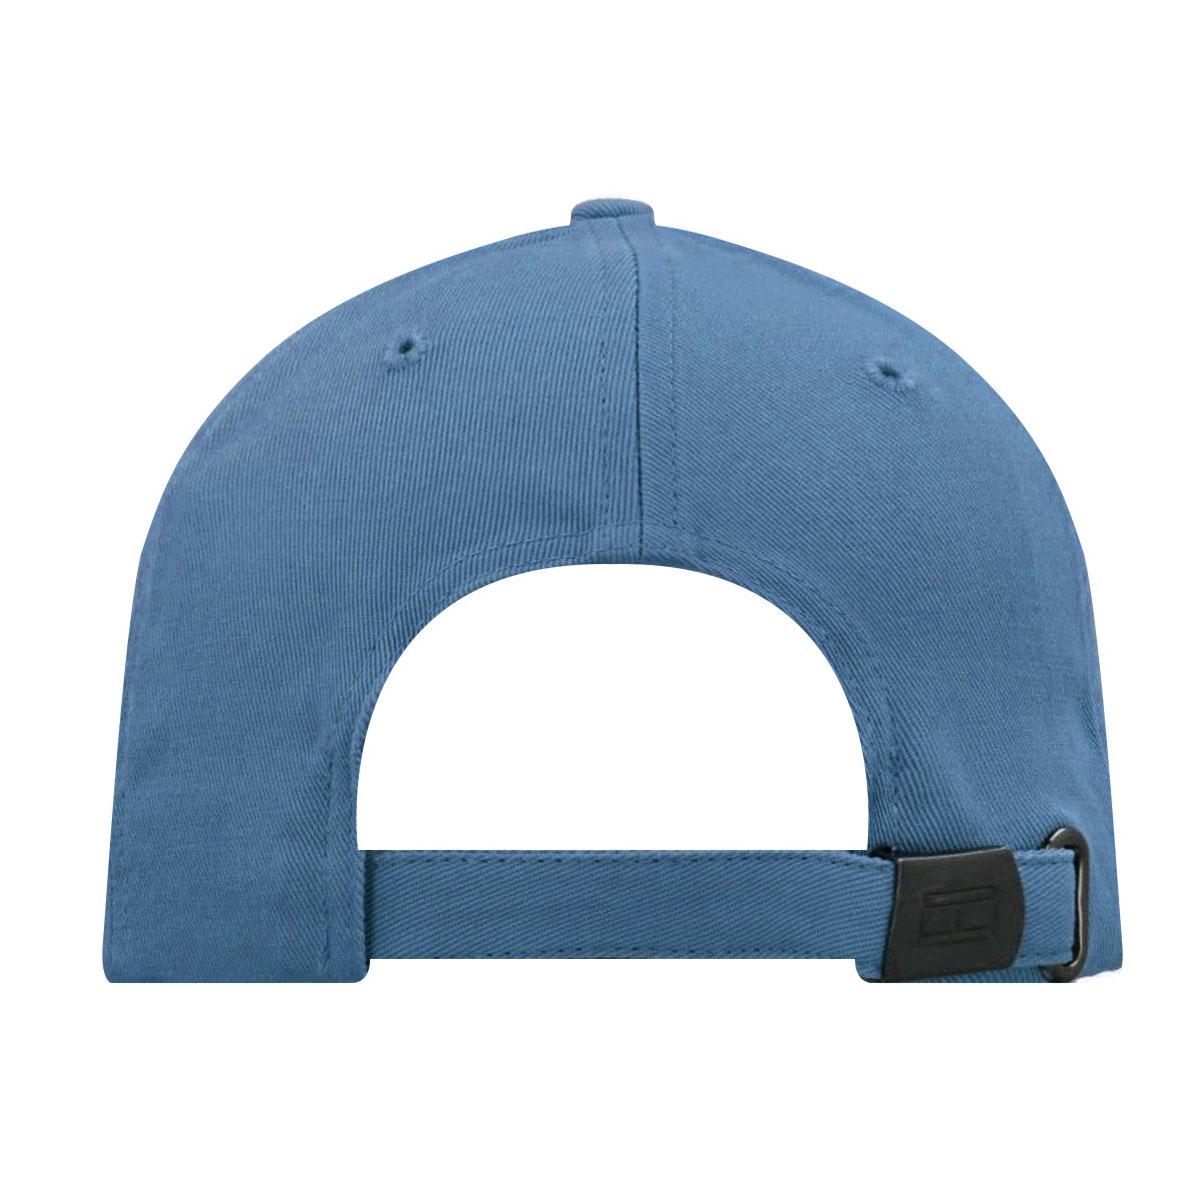 Boné Tommy Hilfiger Classic BB Cap Masculino Azul